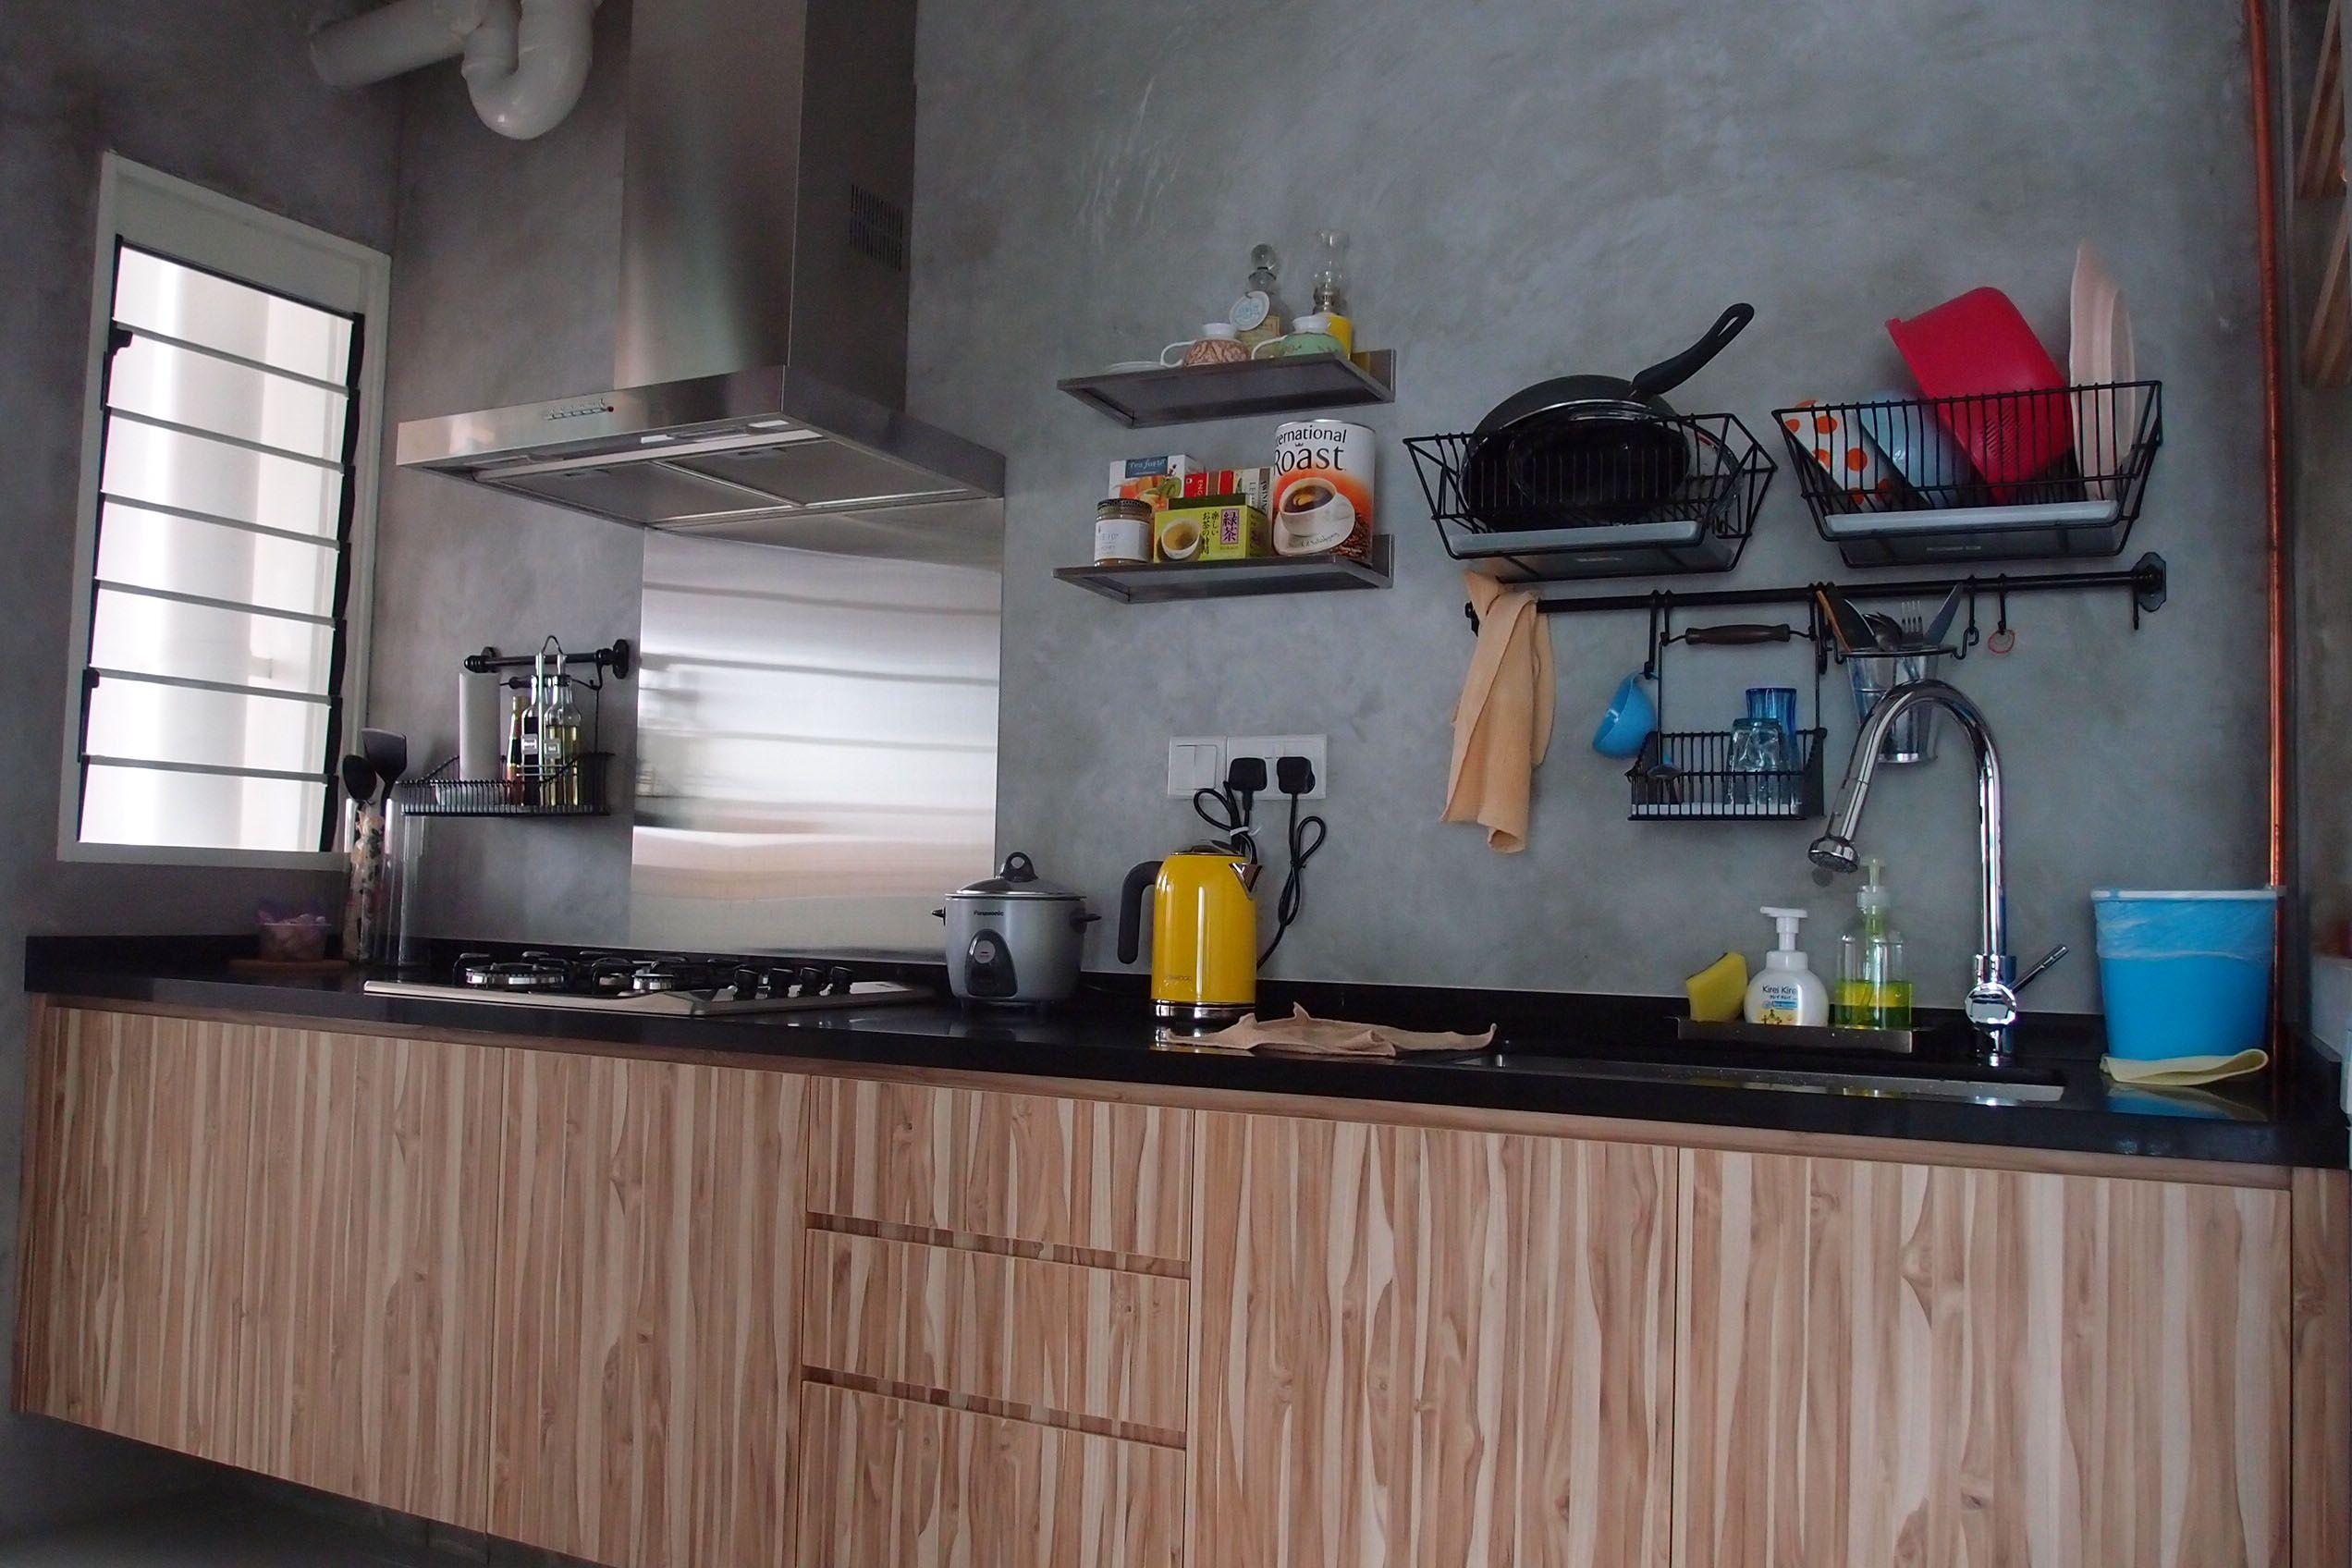 Kitchen No Wall Cabinets Design Dilemma No Upper Cabinets In The Kitchen Kitchen Without